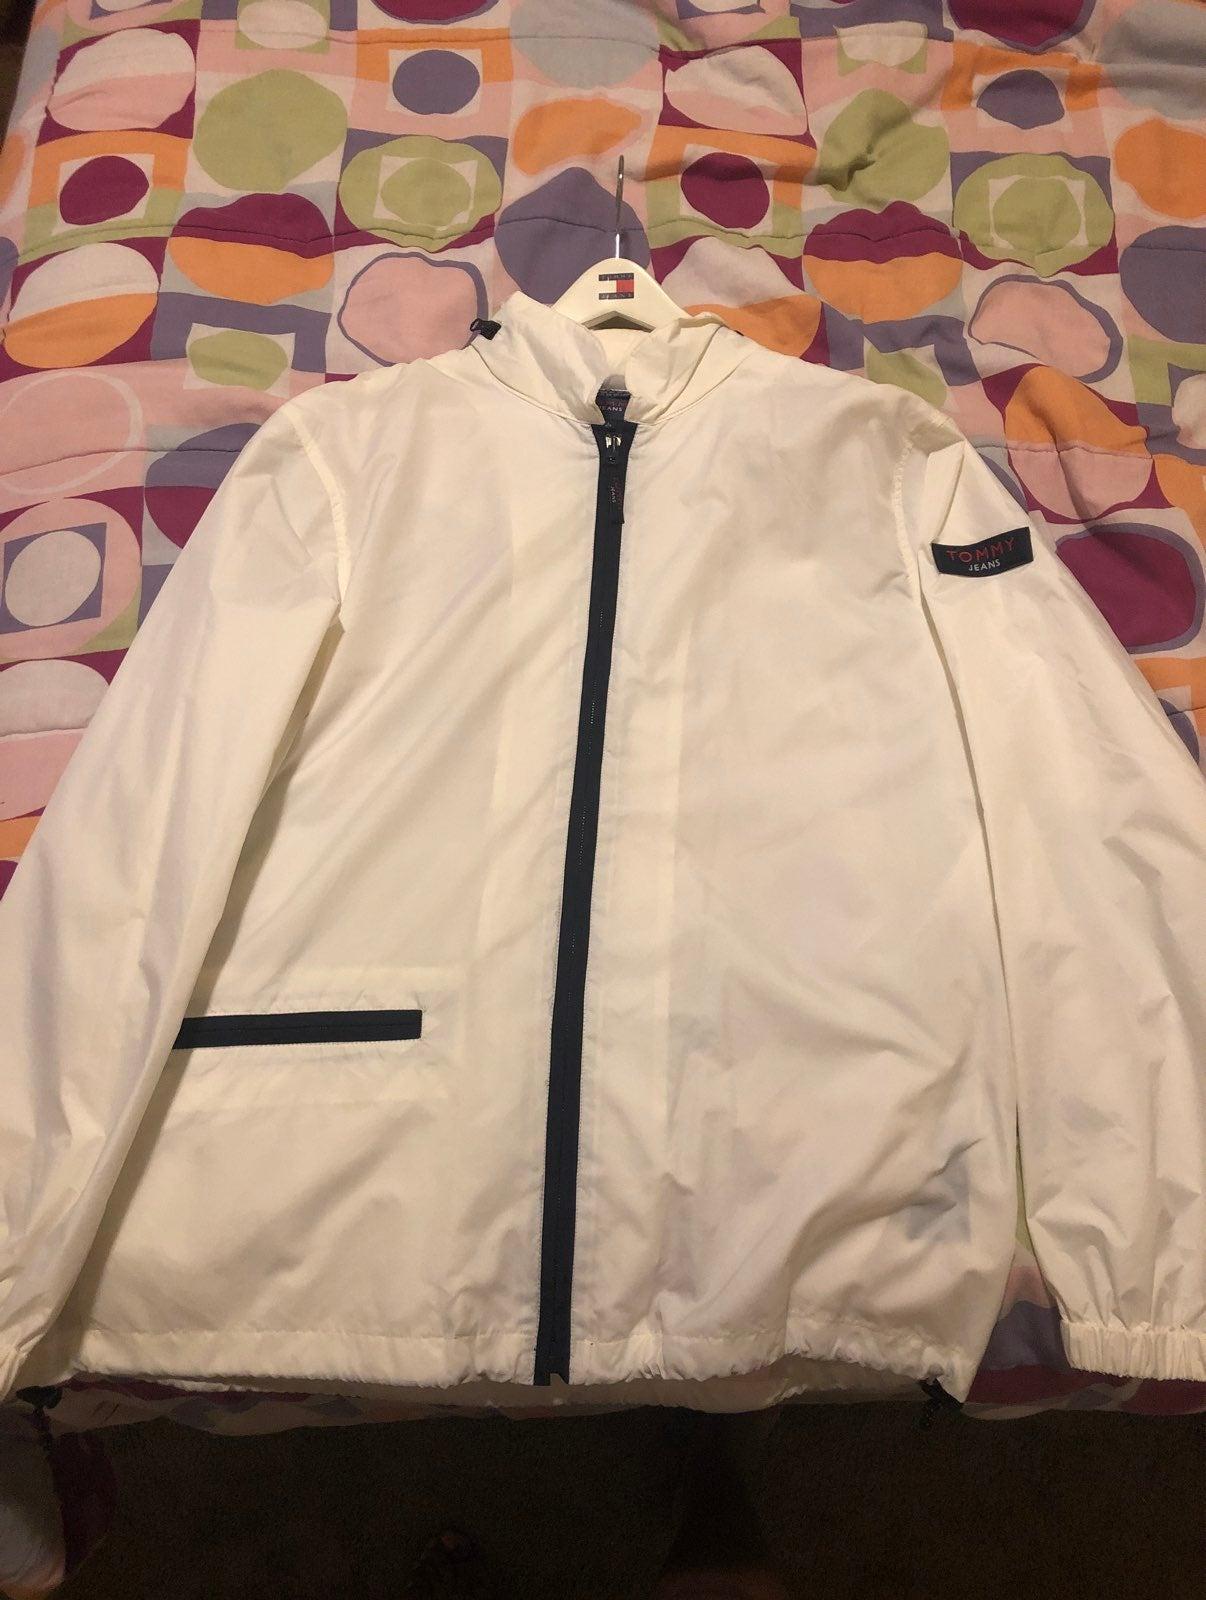 Tommy Hilfiger Retro Zip Up Jacket